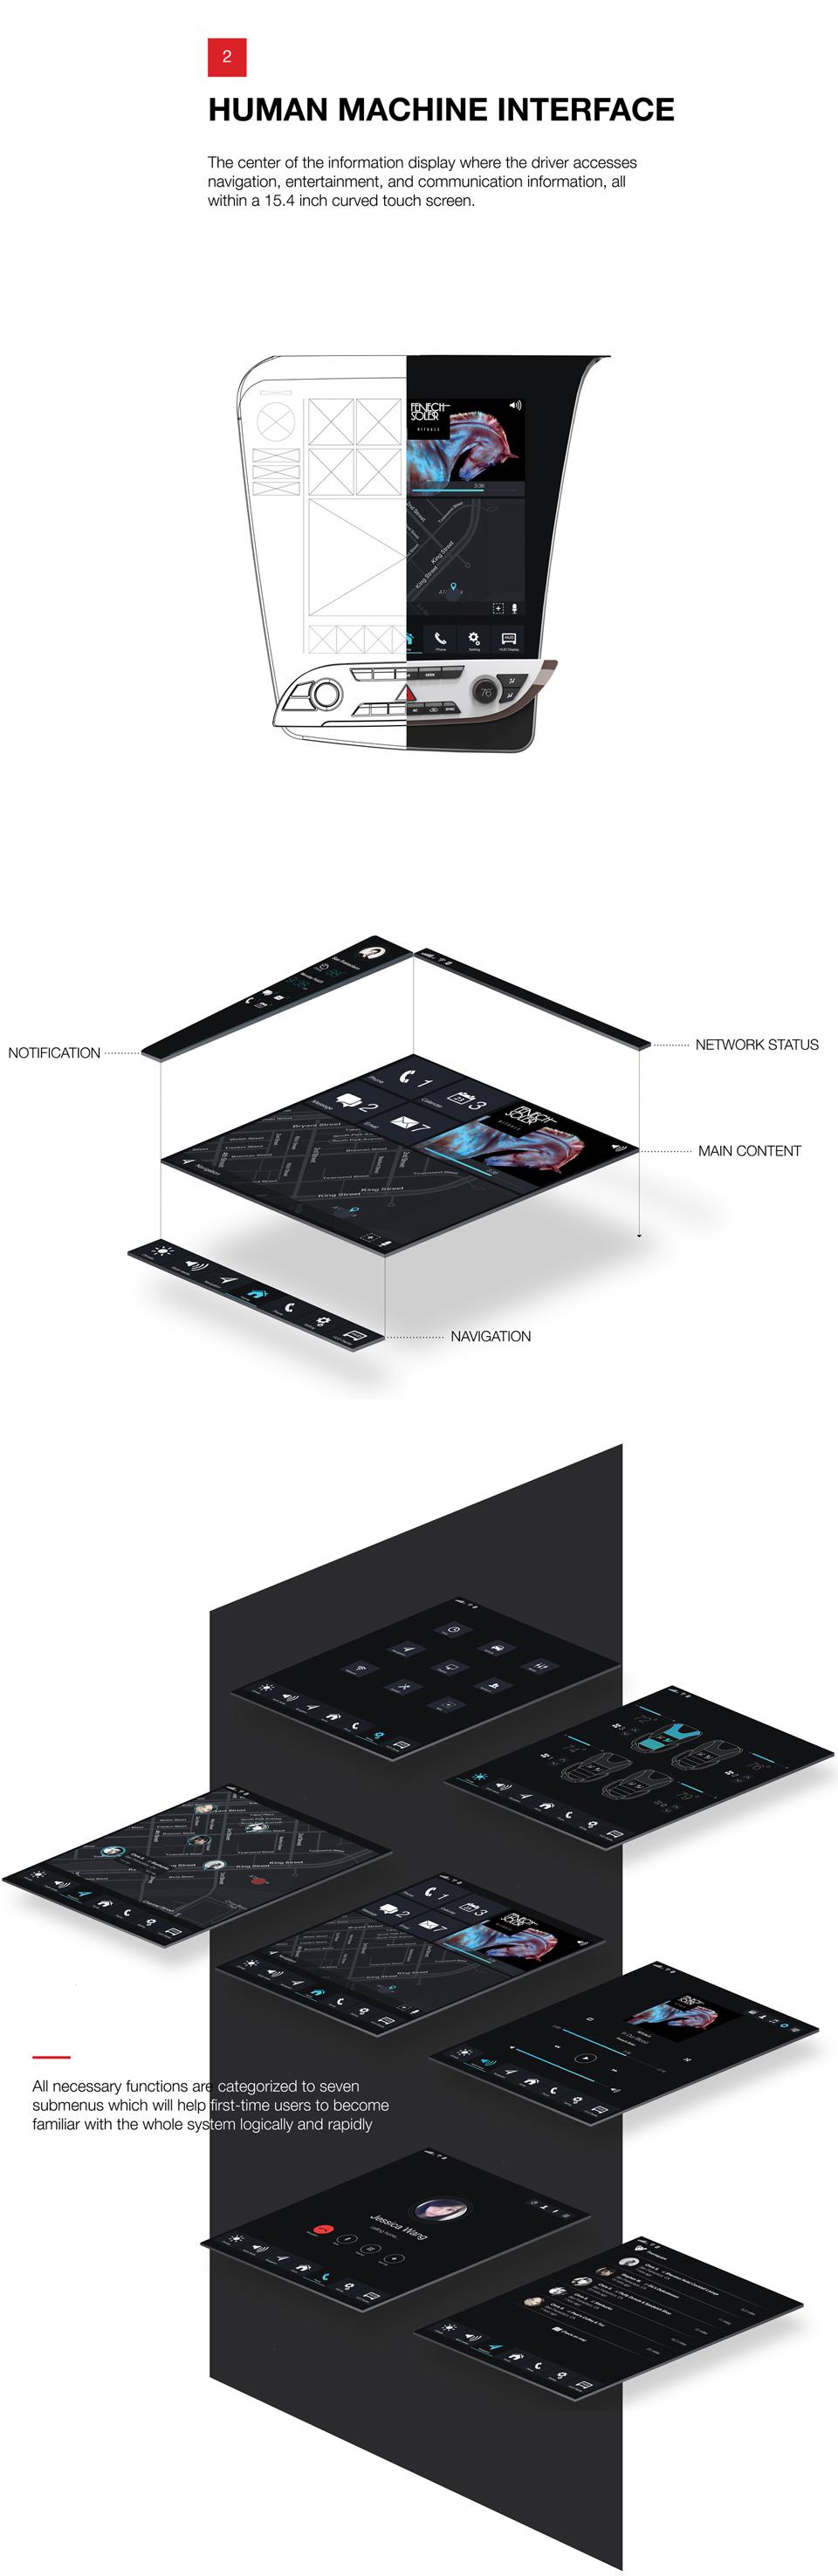 design-present-HMI.jpg